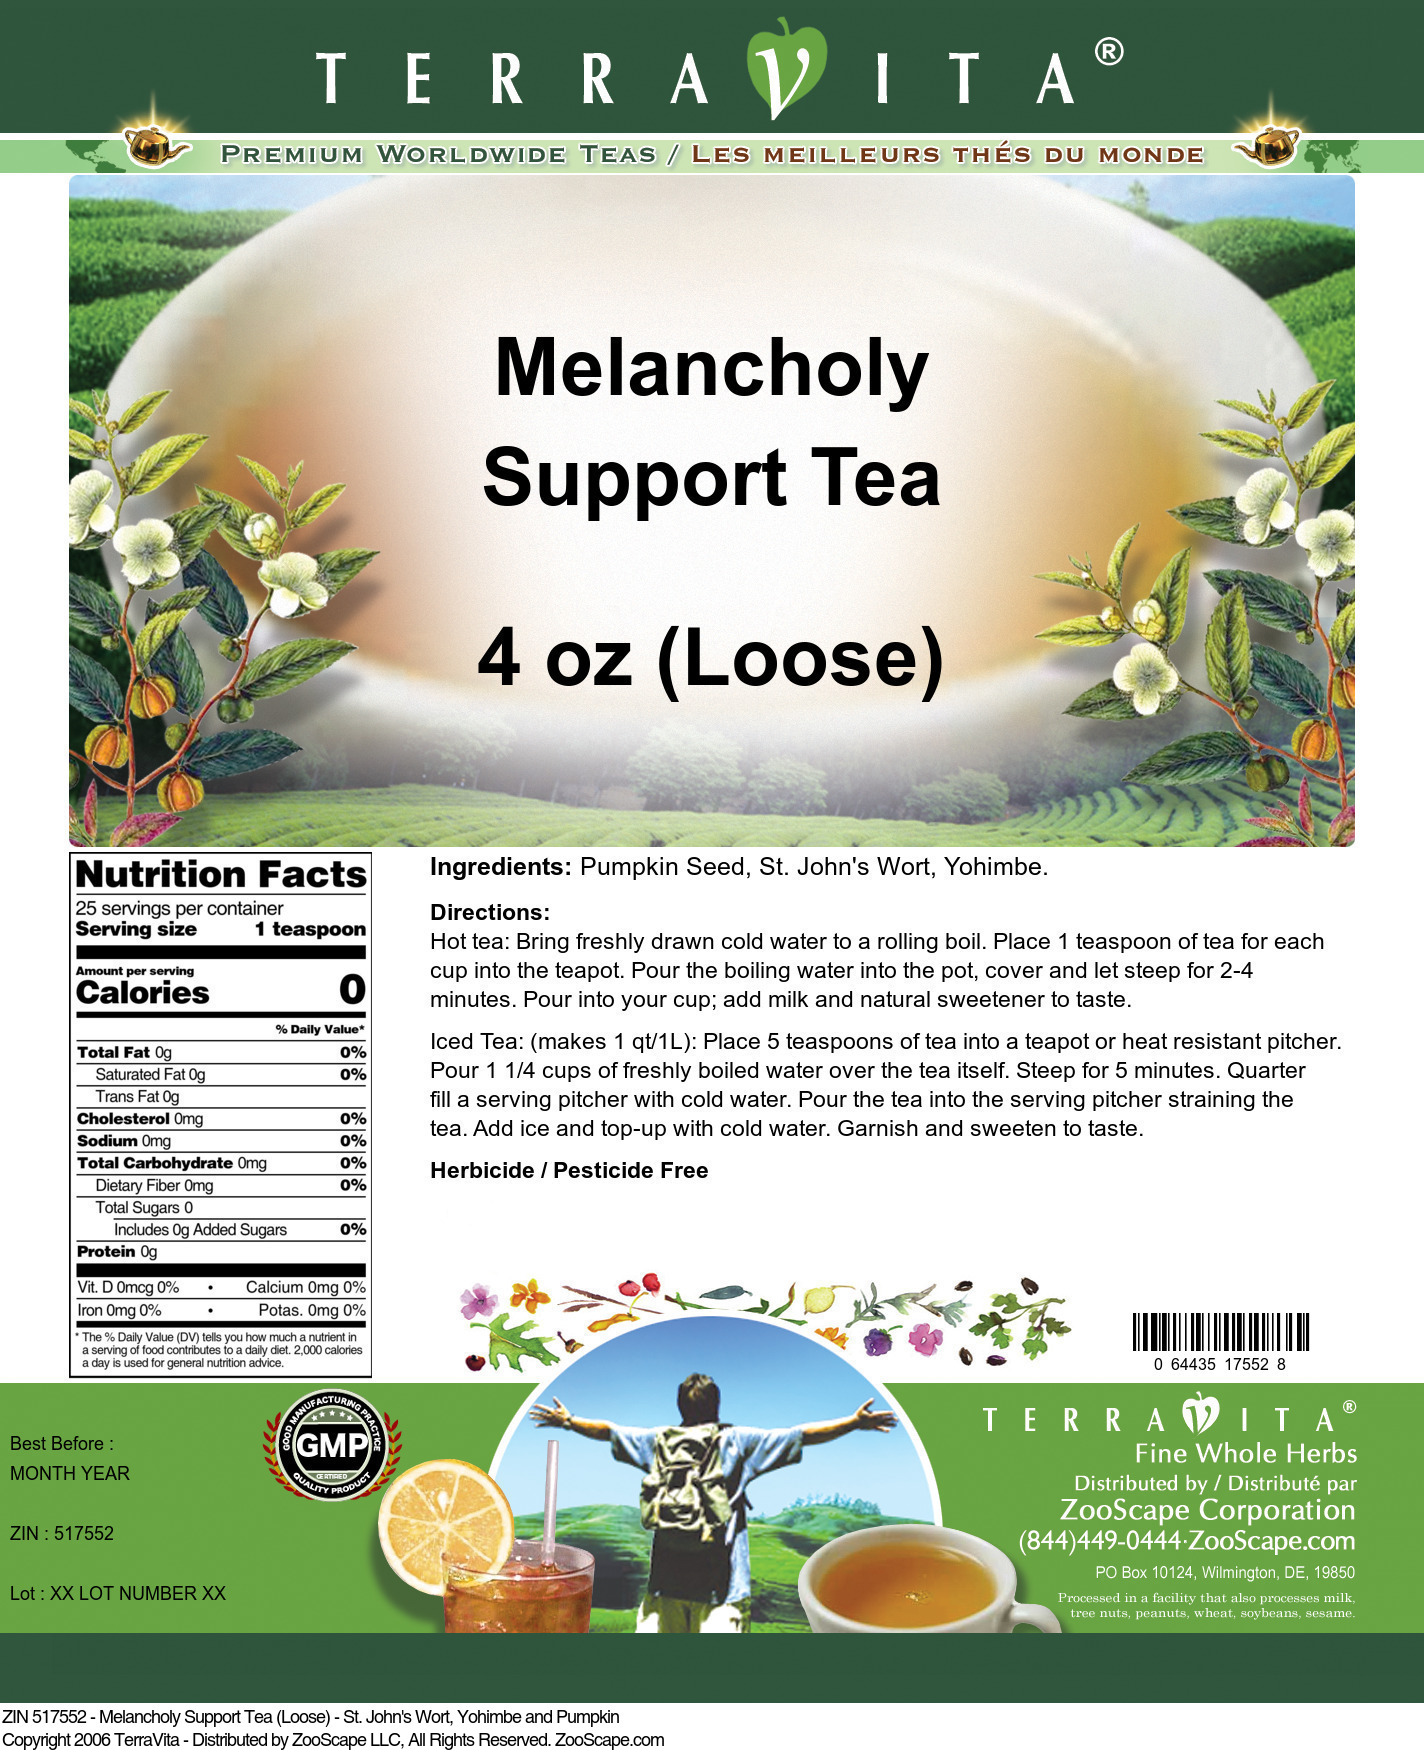 Melancholy Support Tea (Loose) - St. John's Wort, Yohimbe and Pumpkin